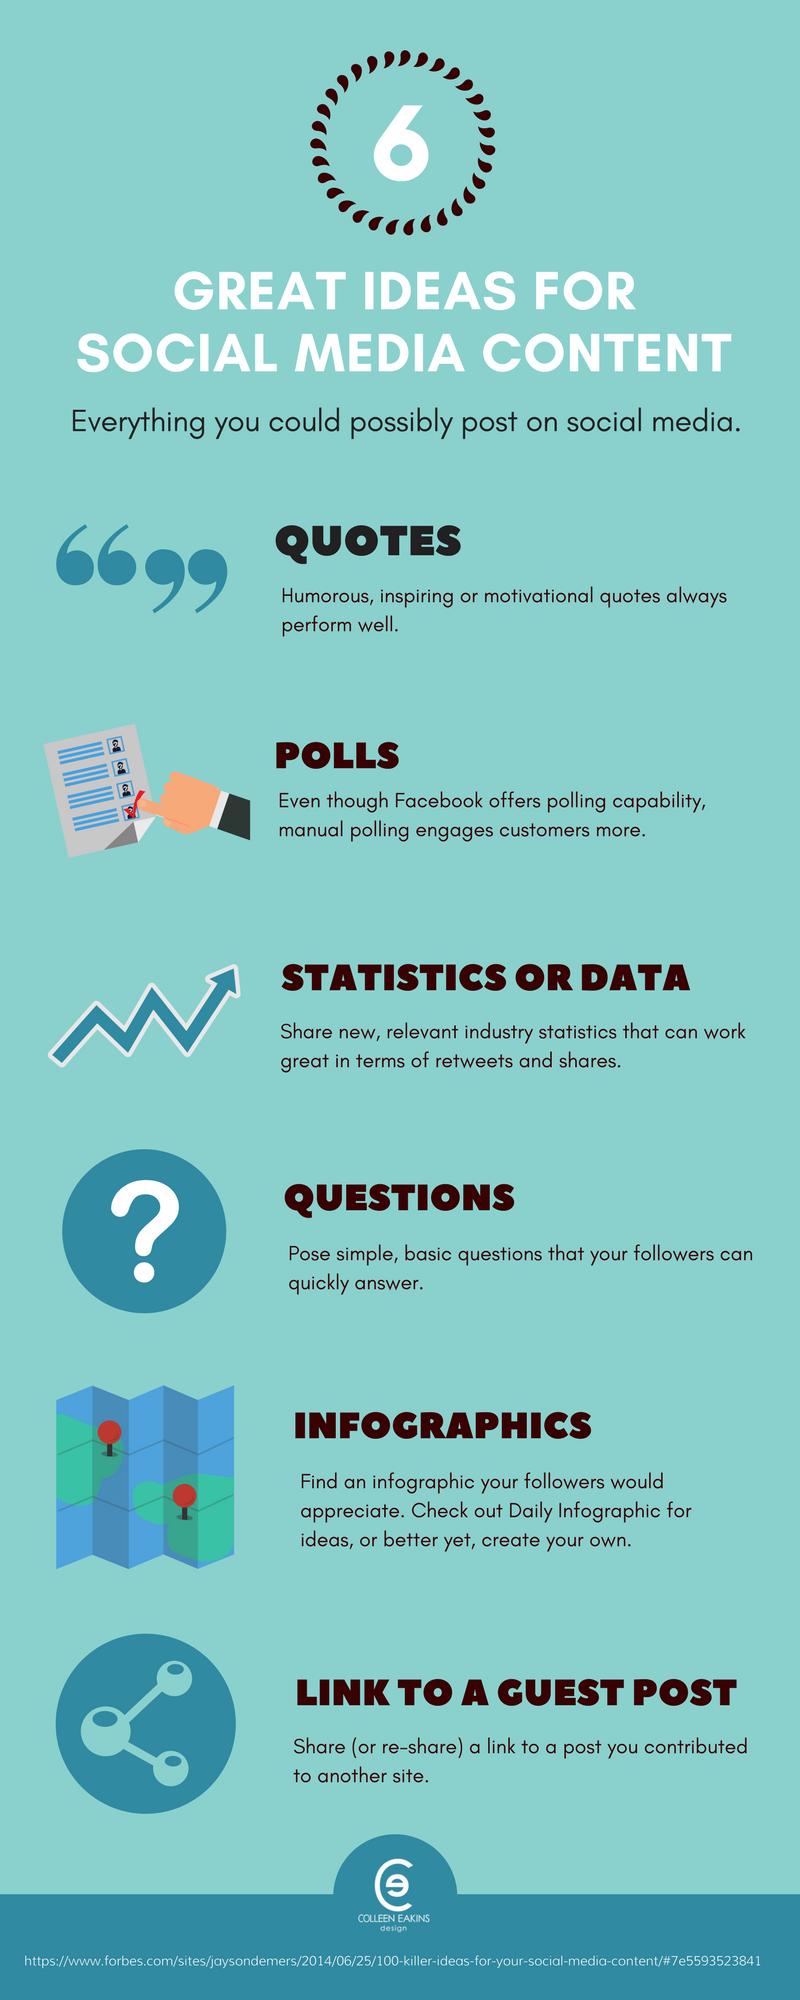 6 Social Media Content Ideas [infographic]   Colleen Eakins Design Blog